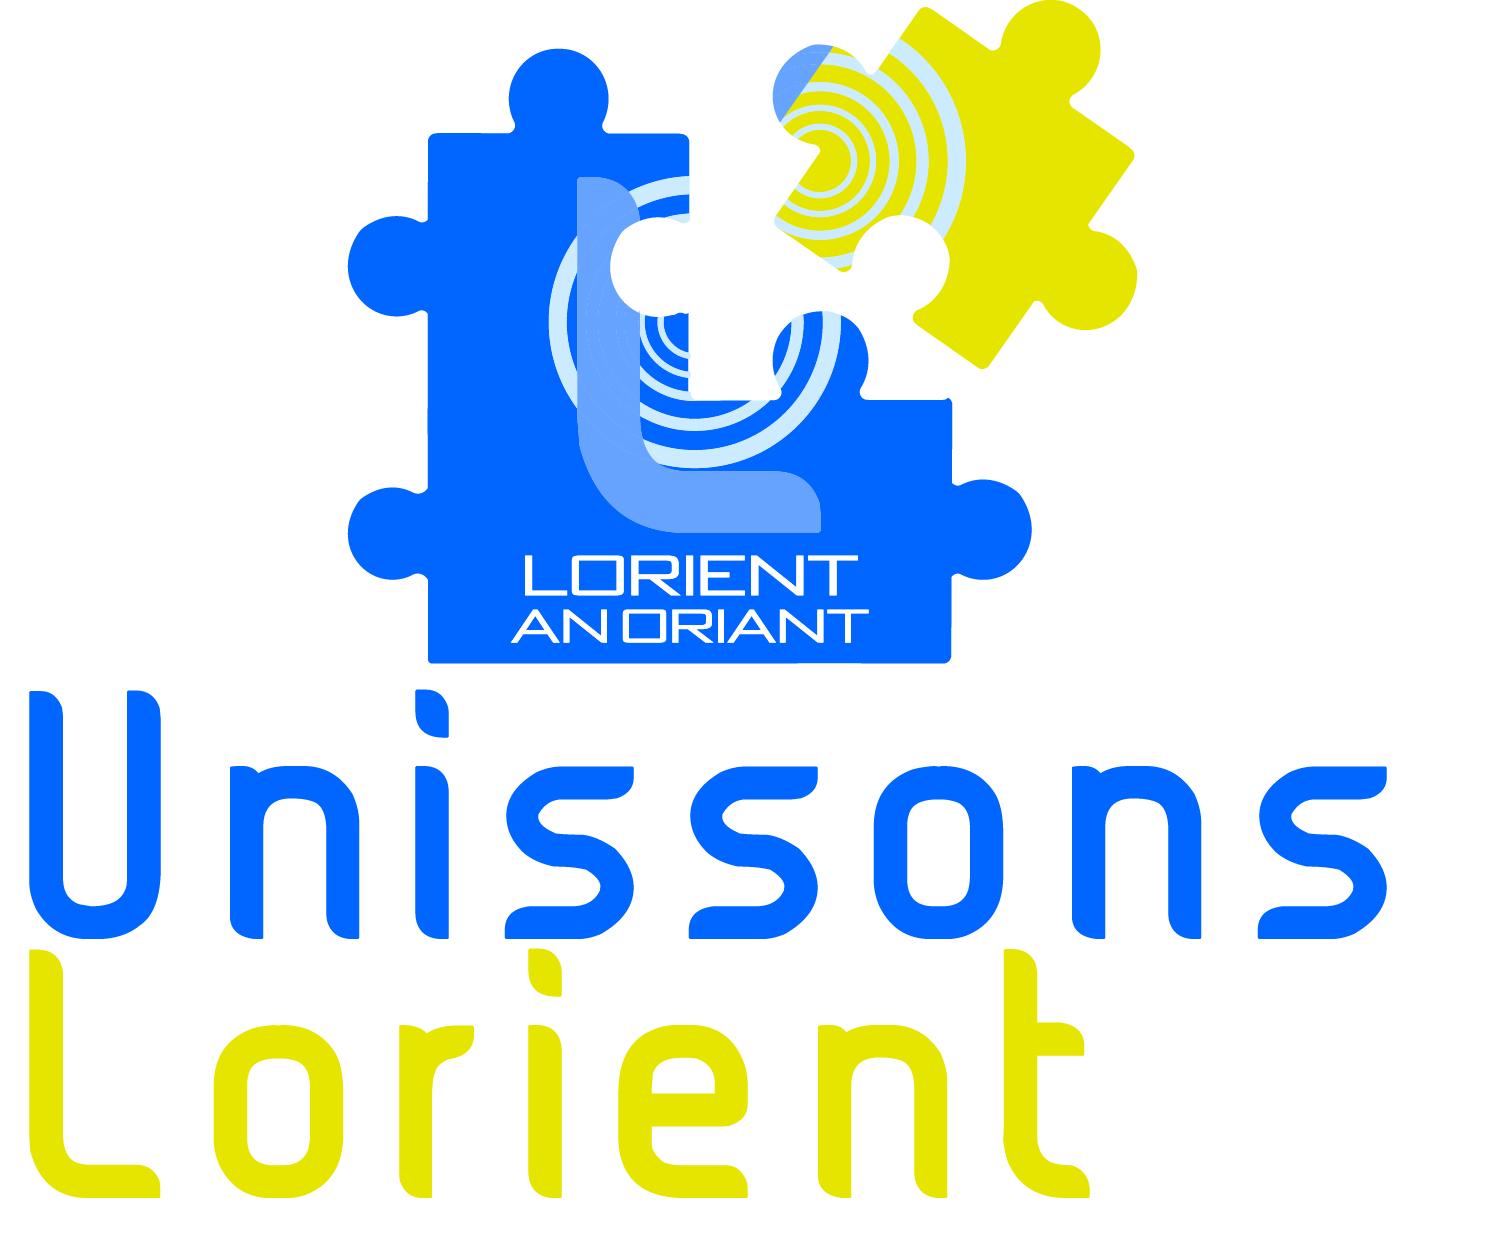 Unissons Lorient